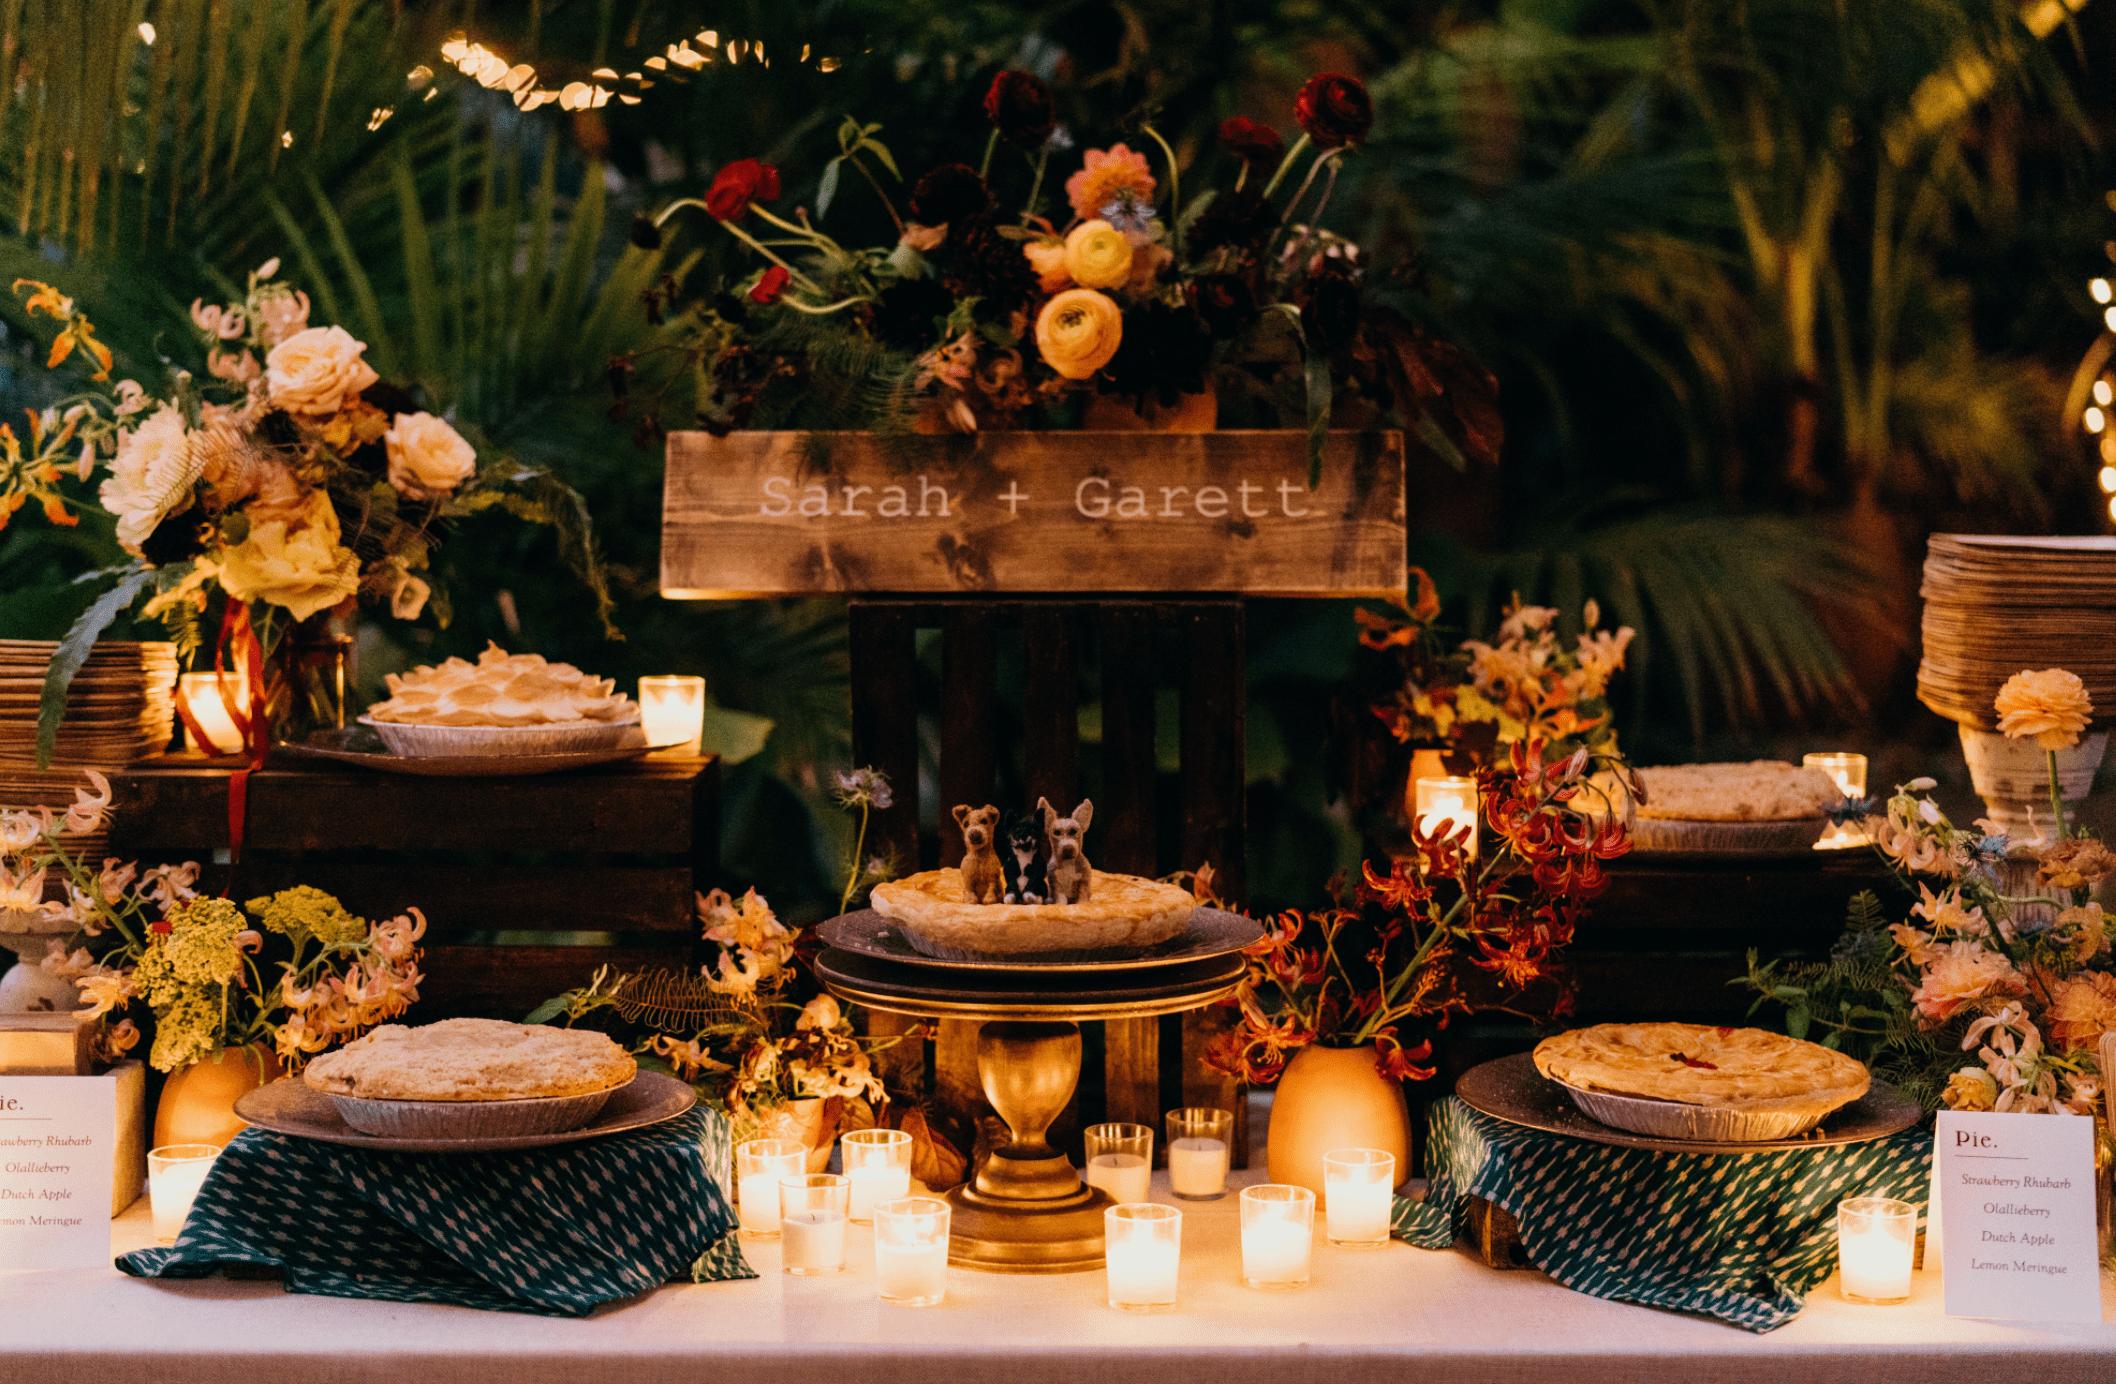 Pie dessert table